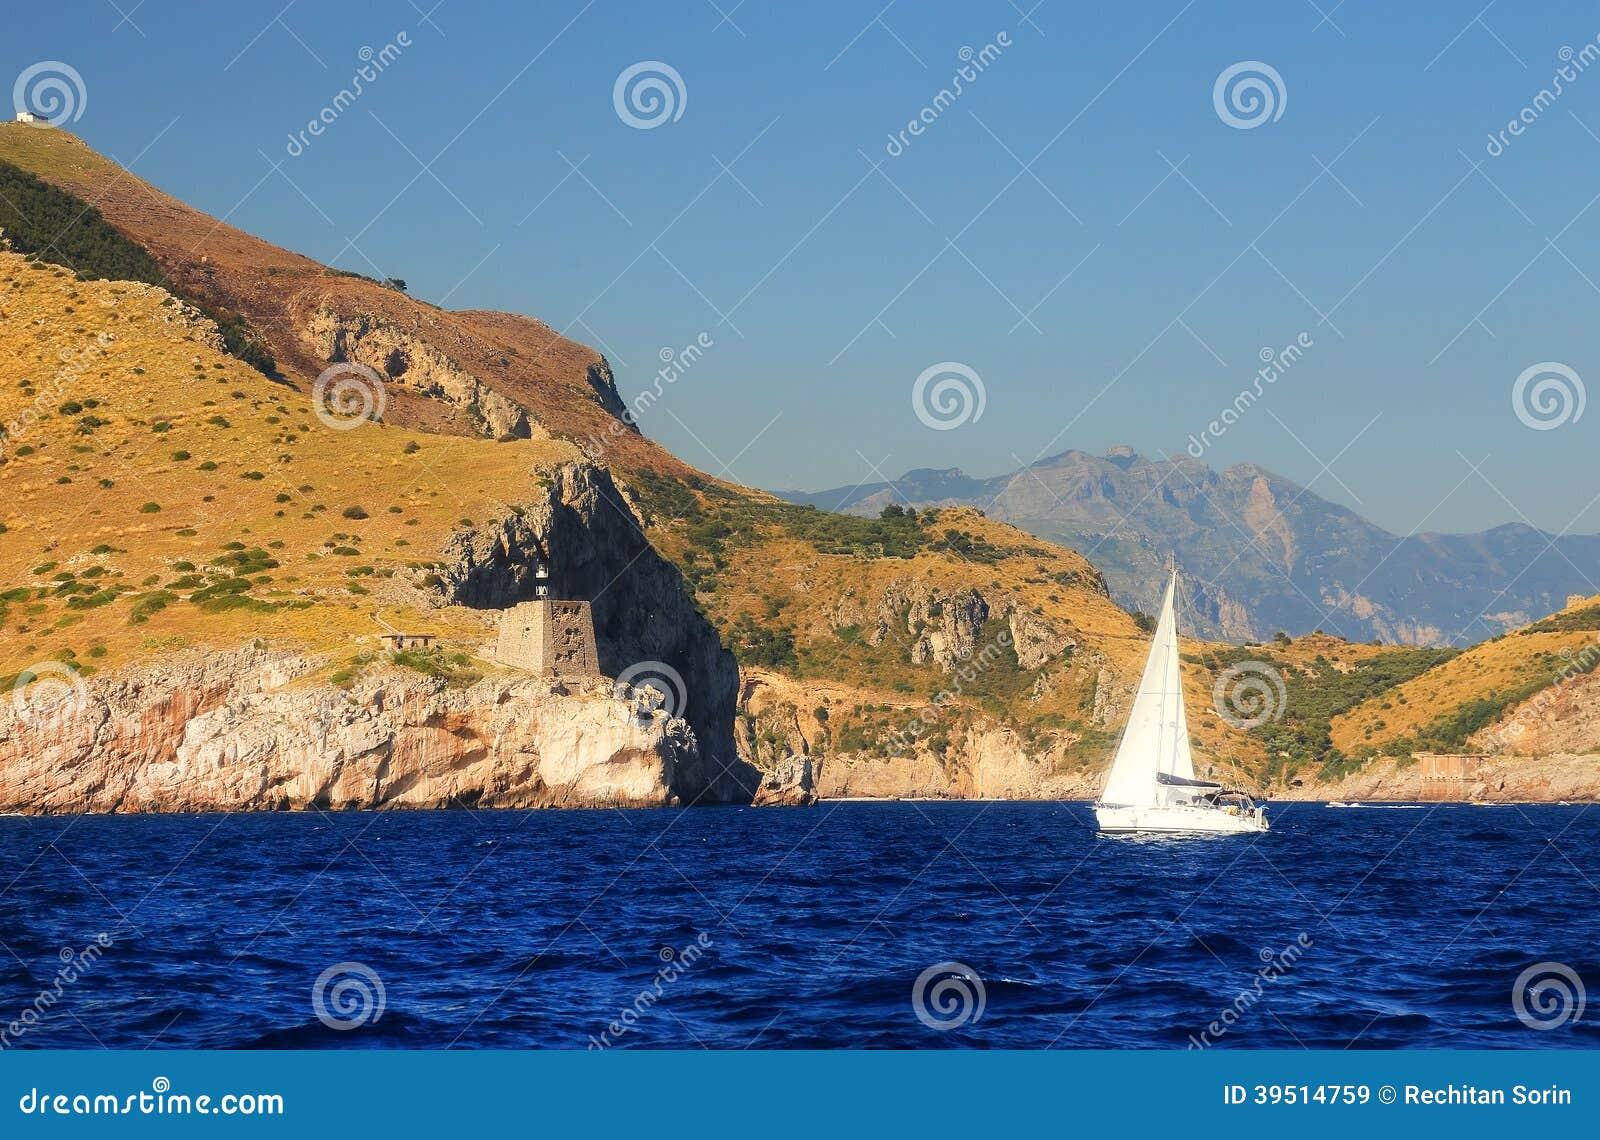 Yachting at Capri Island, Italy